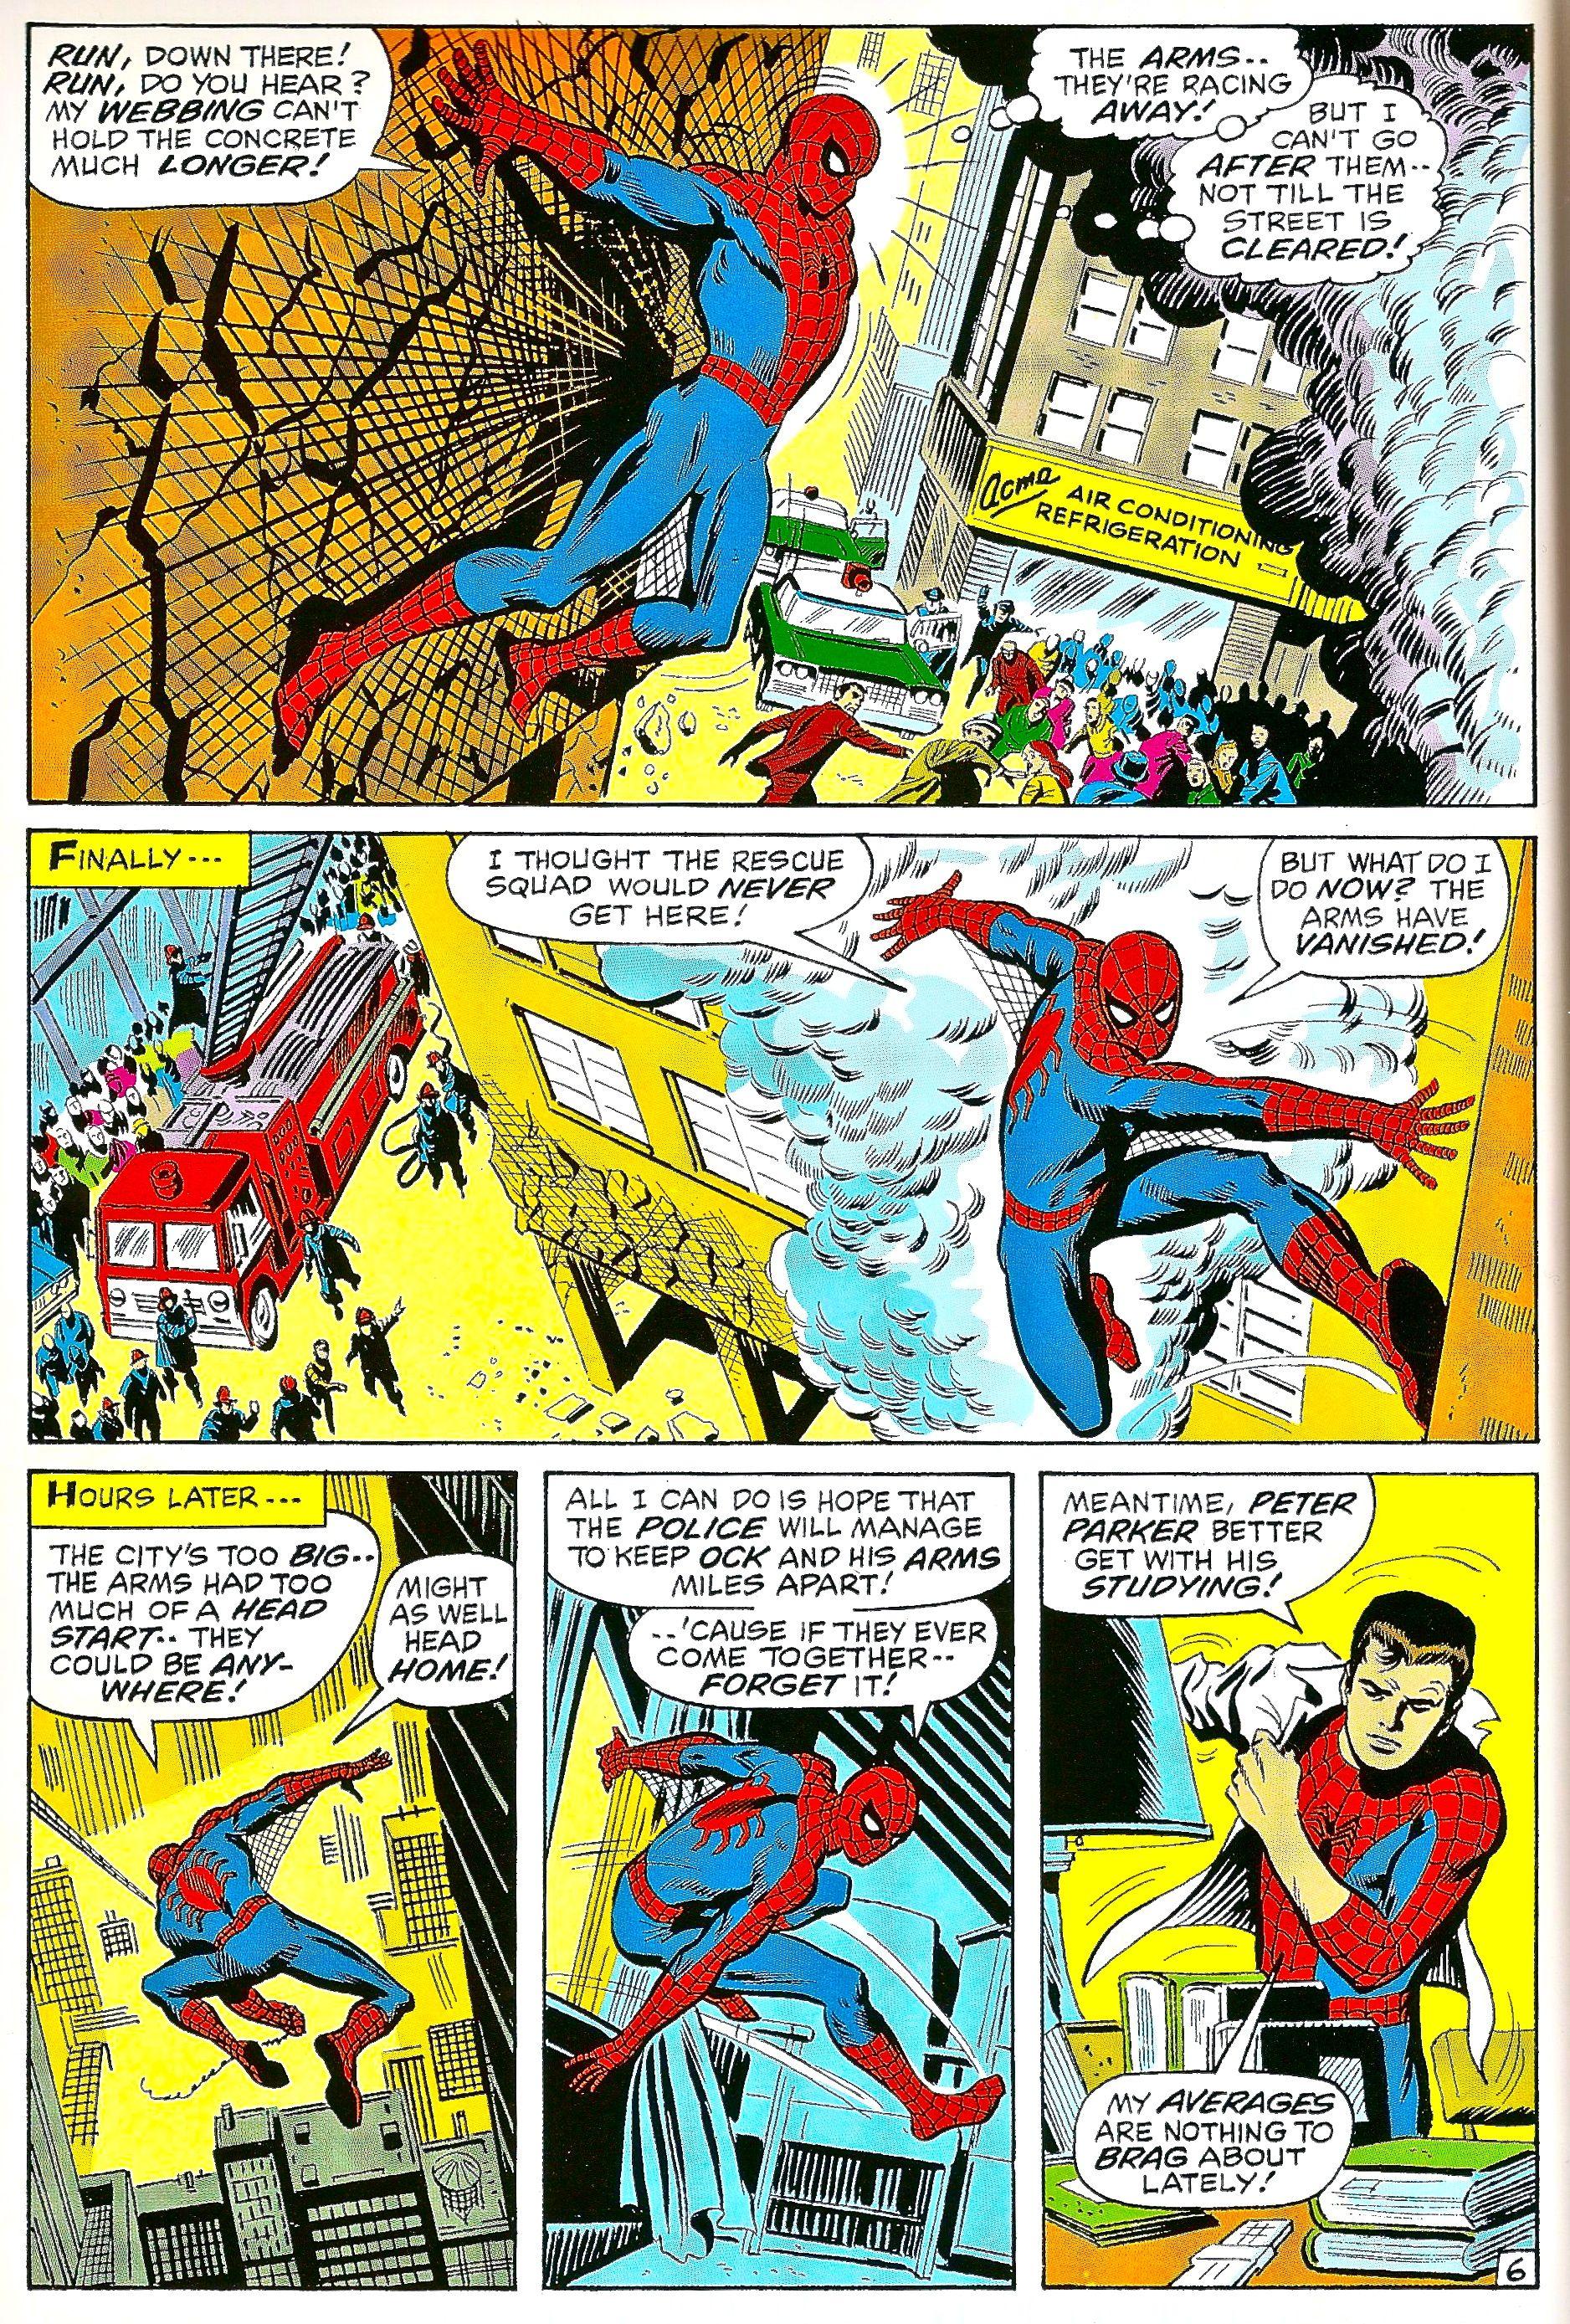 marvel comic strip template  comic. free printable | Spiderman comic books, Comic book ...